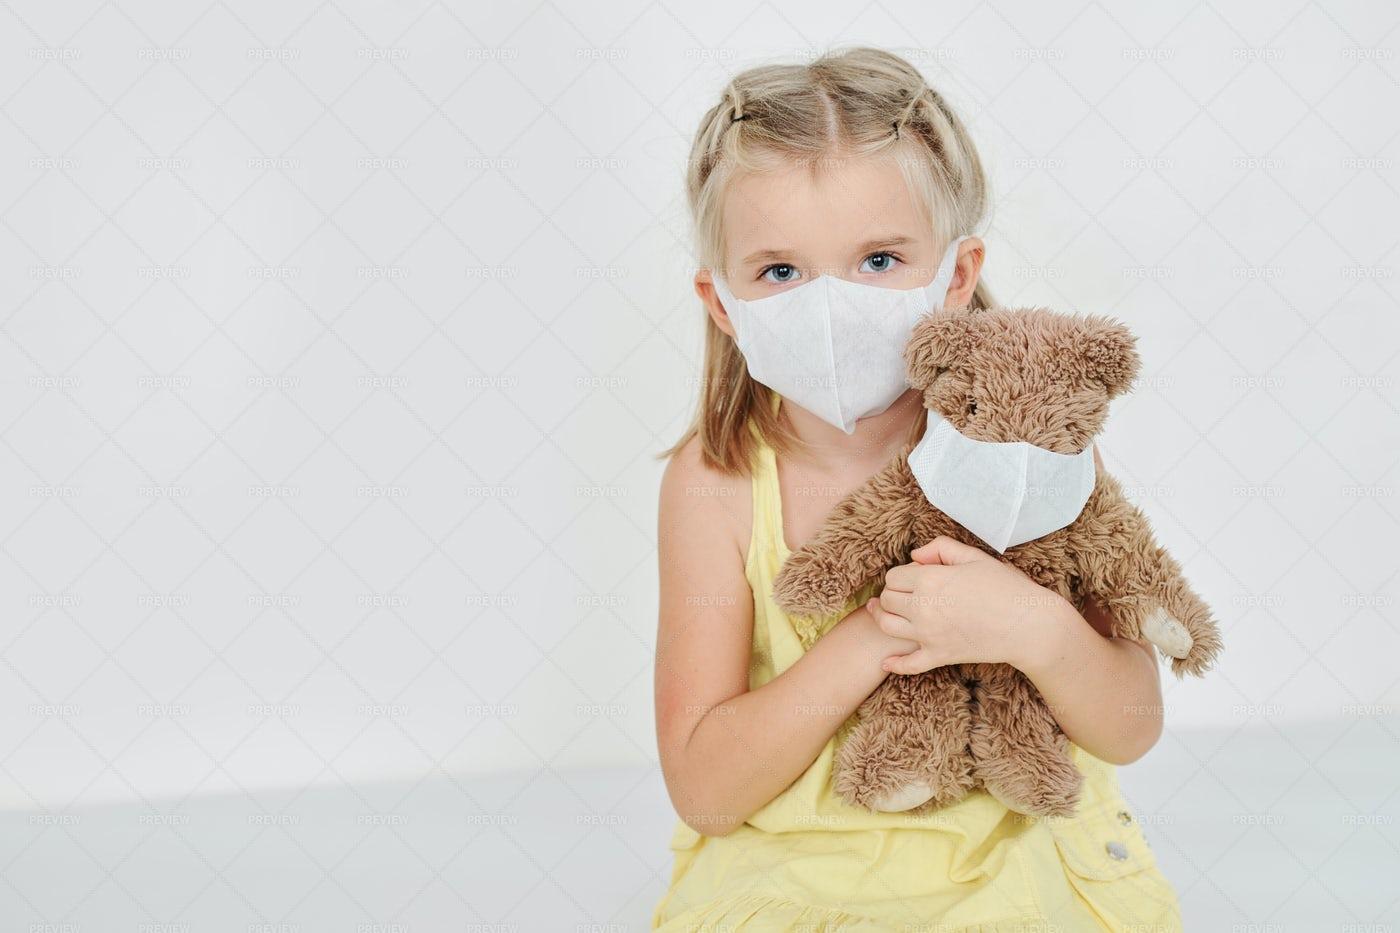 Sick Girl In Medical Mask: Stock Photos